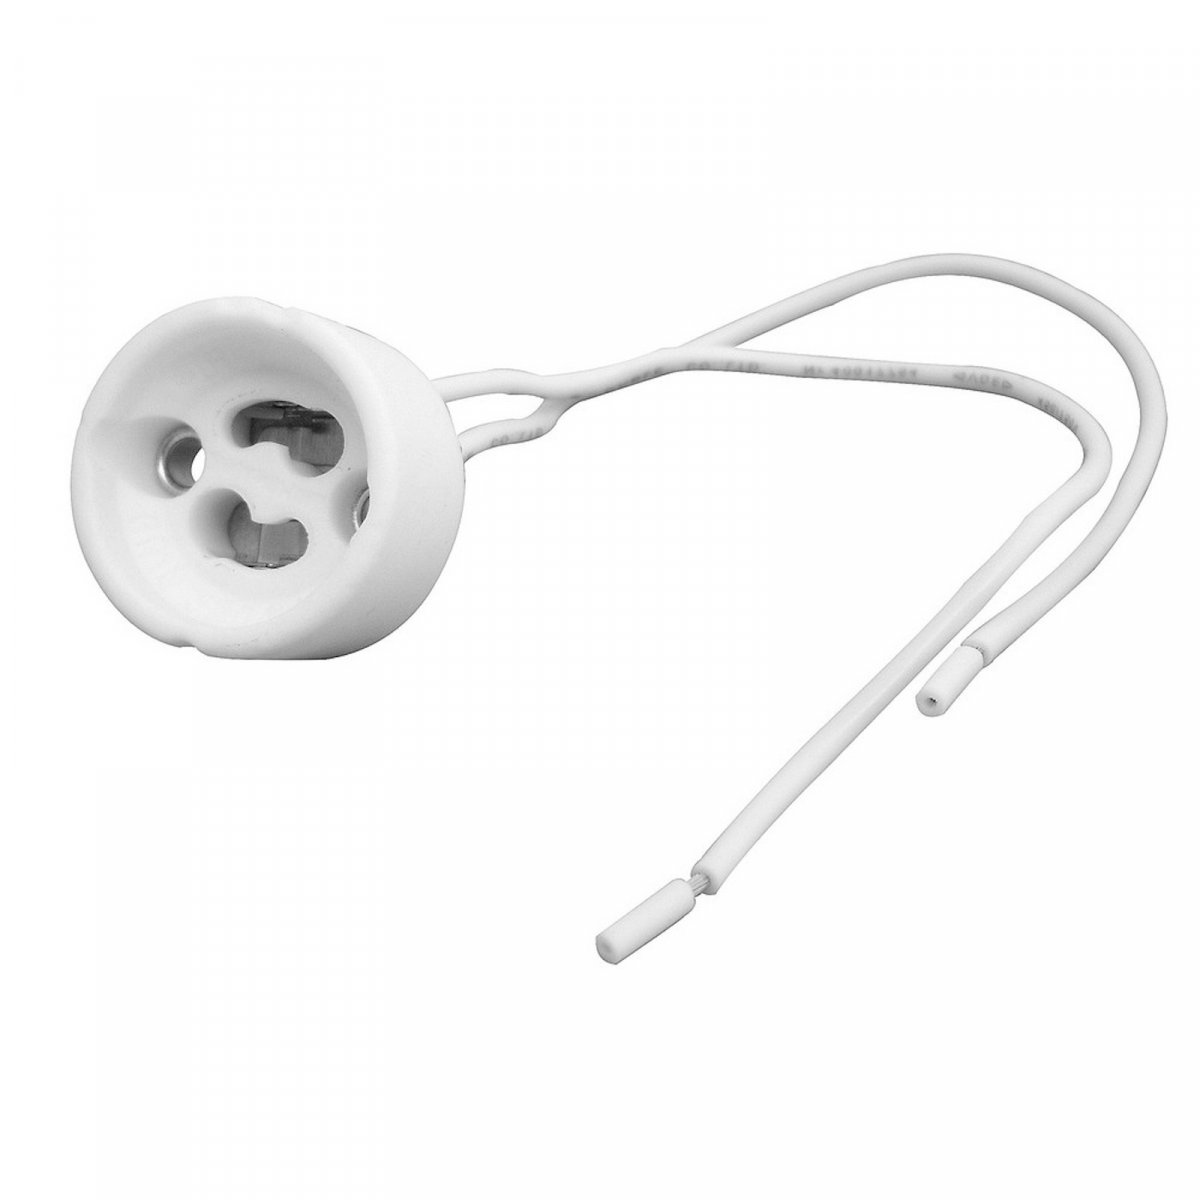 Dimmbar LED Nassraum Feuchraum Dusche IP44 Einbaustrahler Sets 7W LED LM